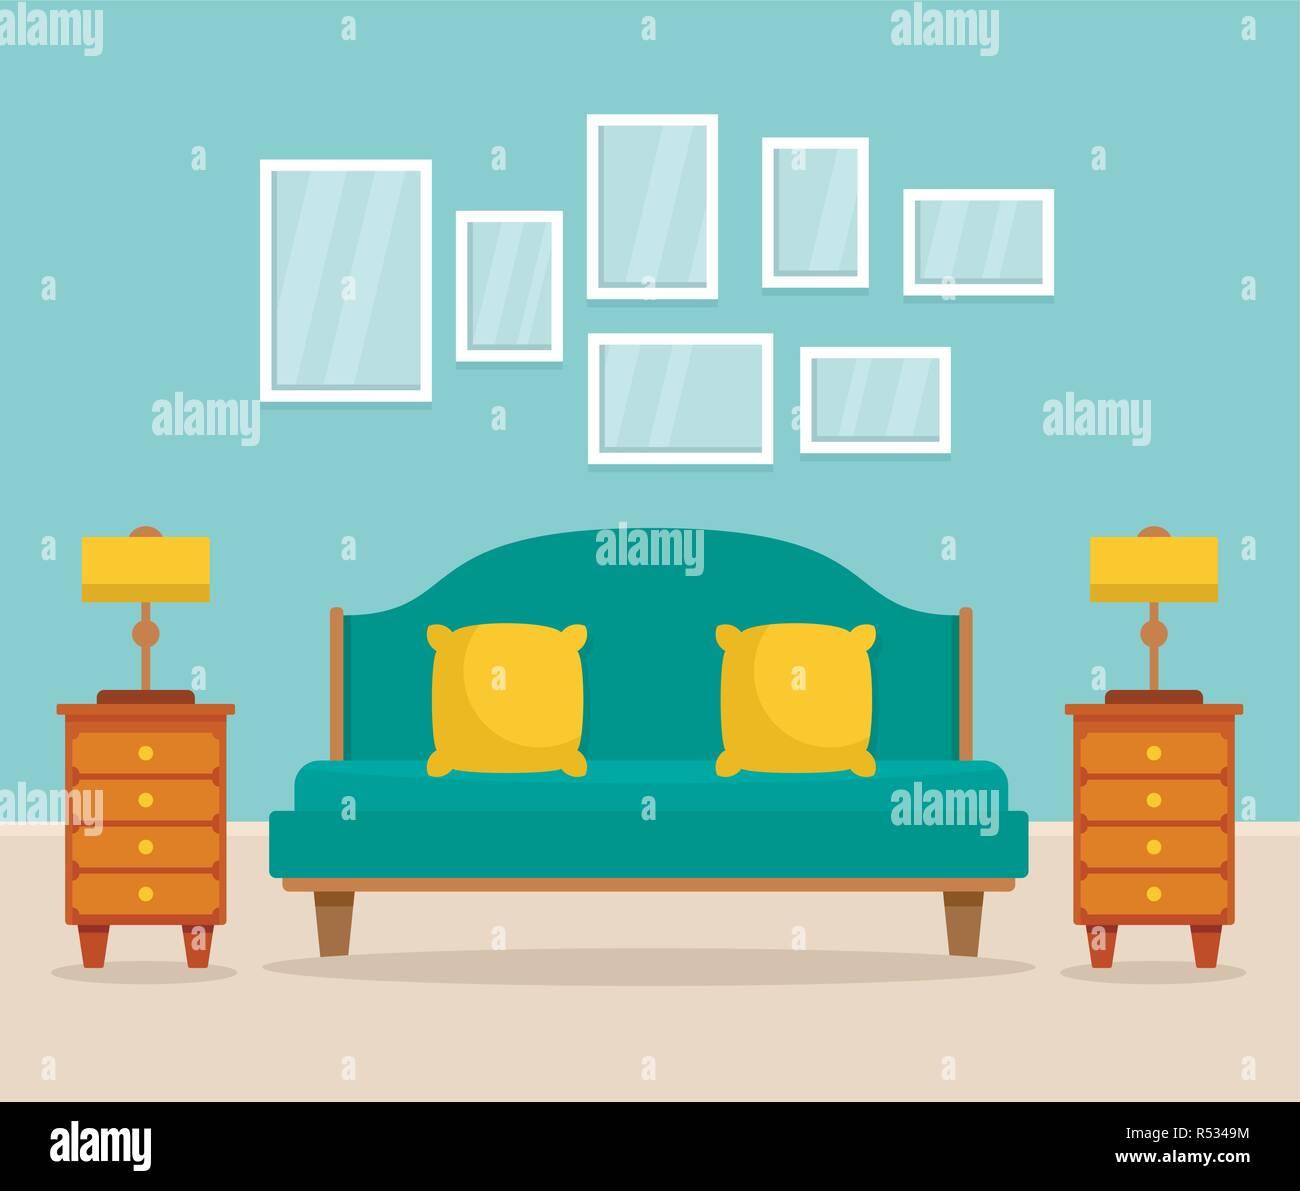 Bedroom interior concept background. Flat illustration of bedroom